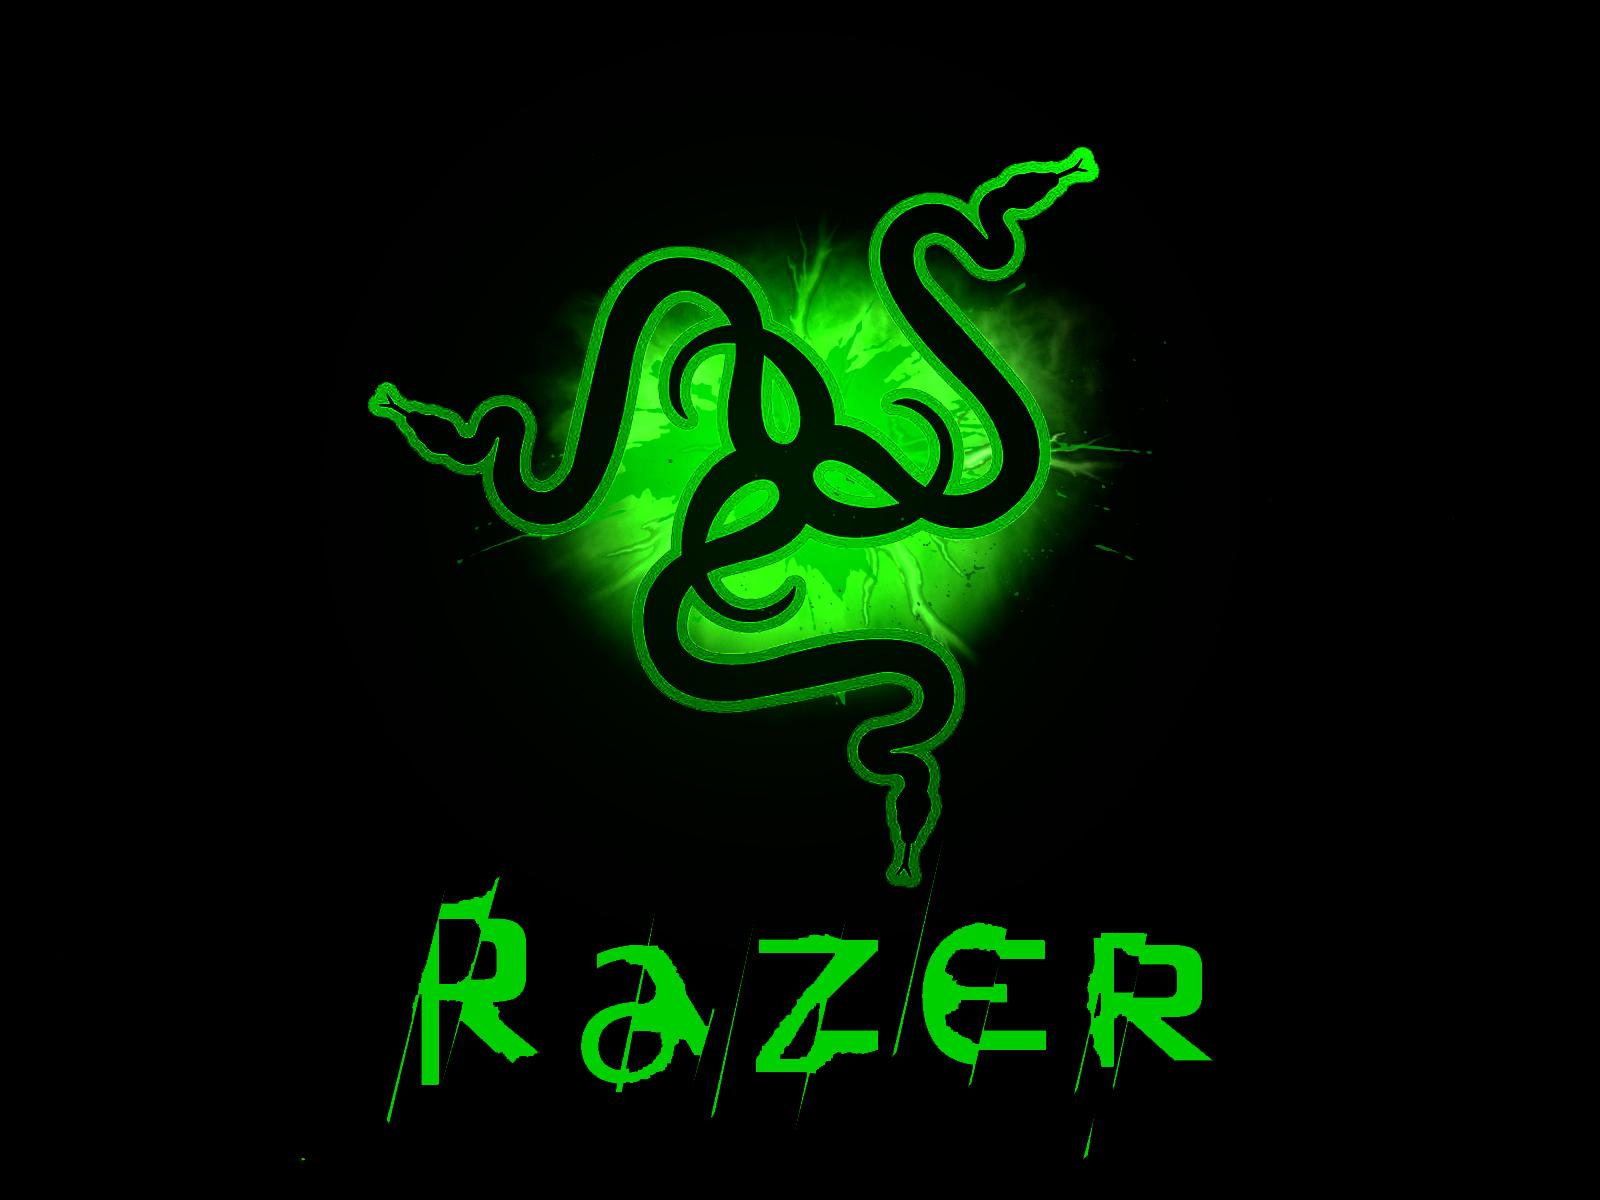 Razer mousepad design by sanktv2 on deviantart for Sfondi razer